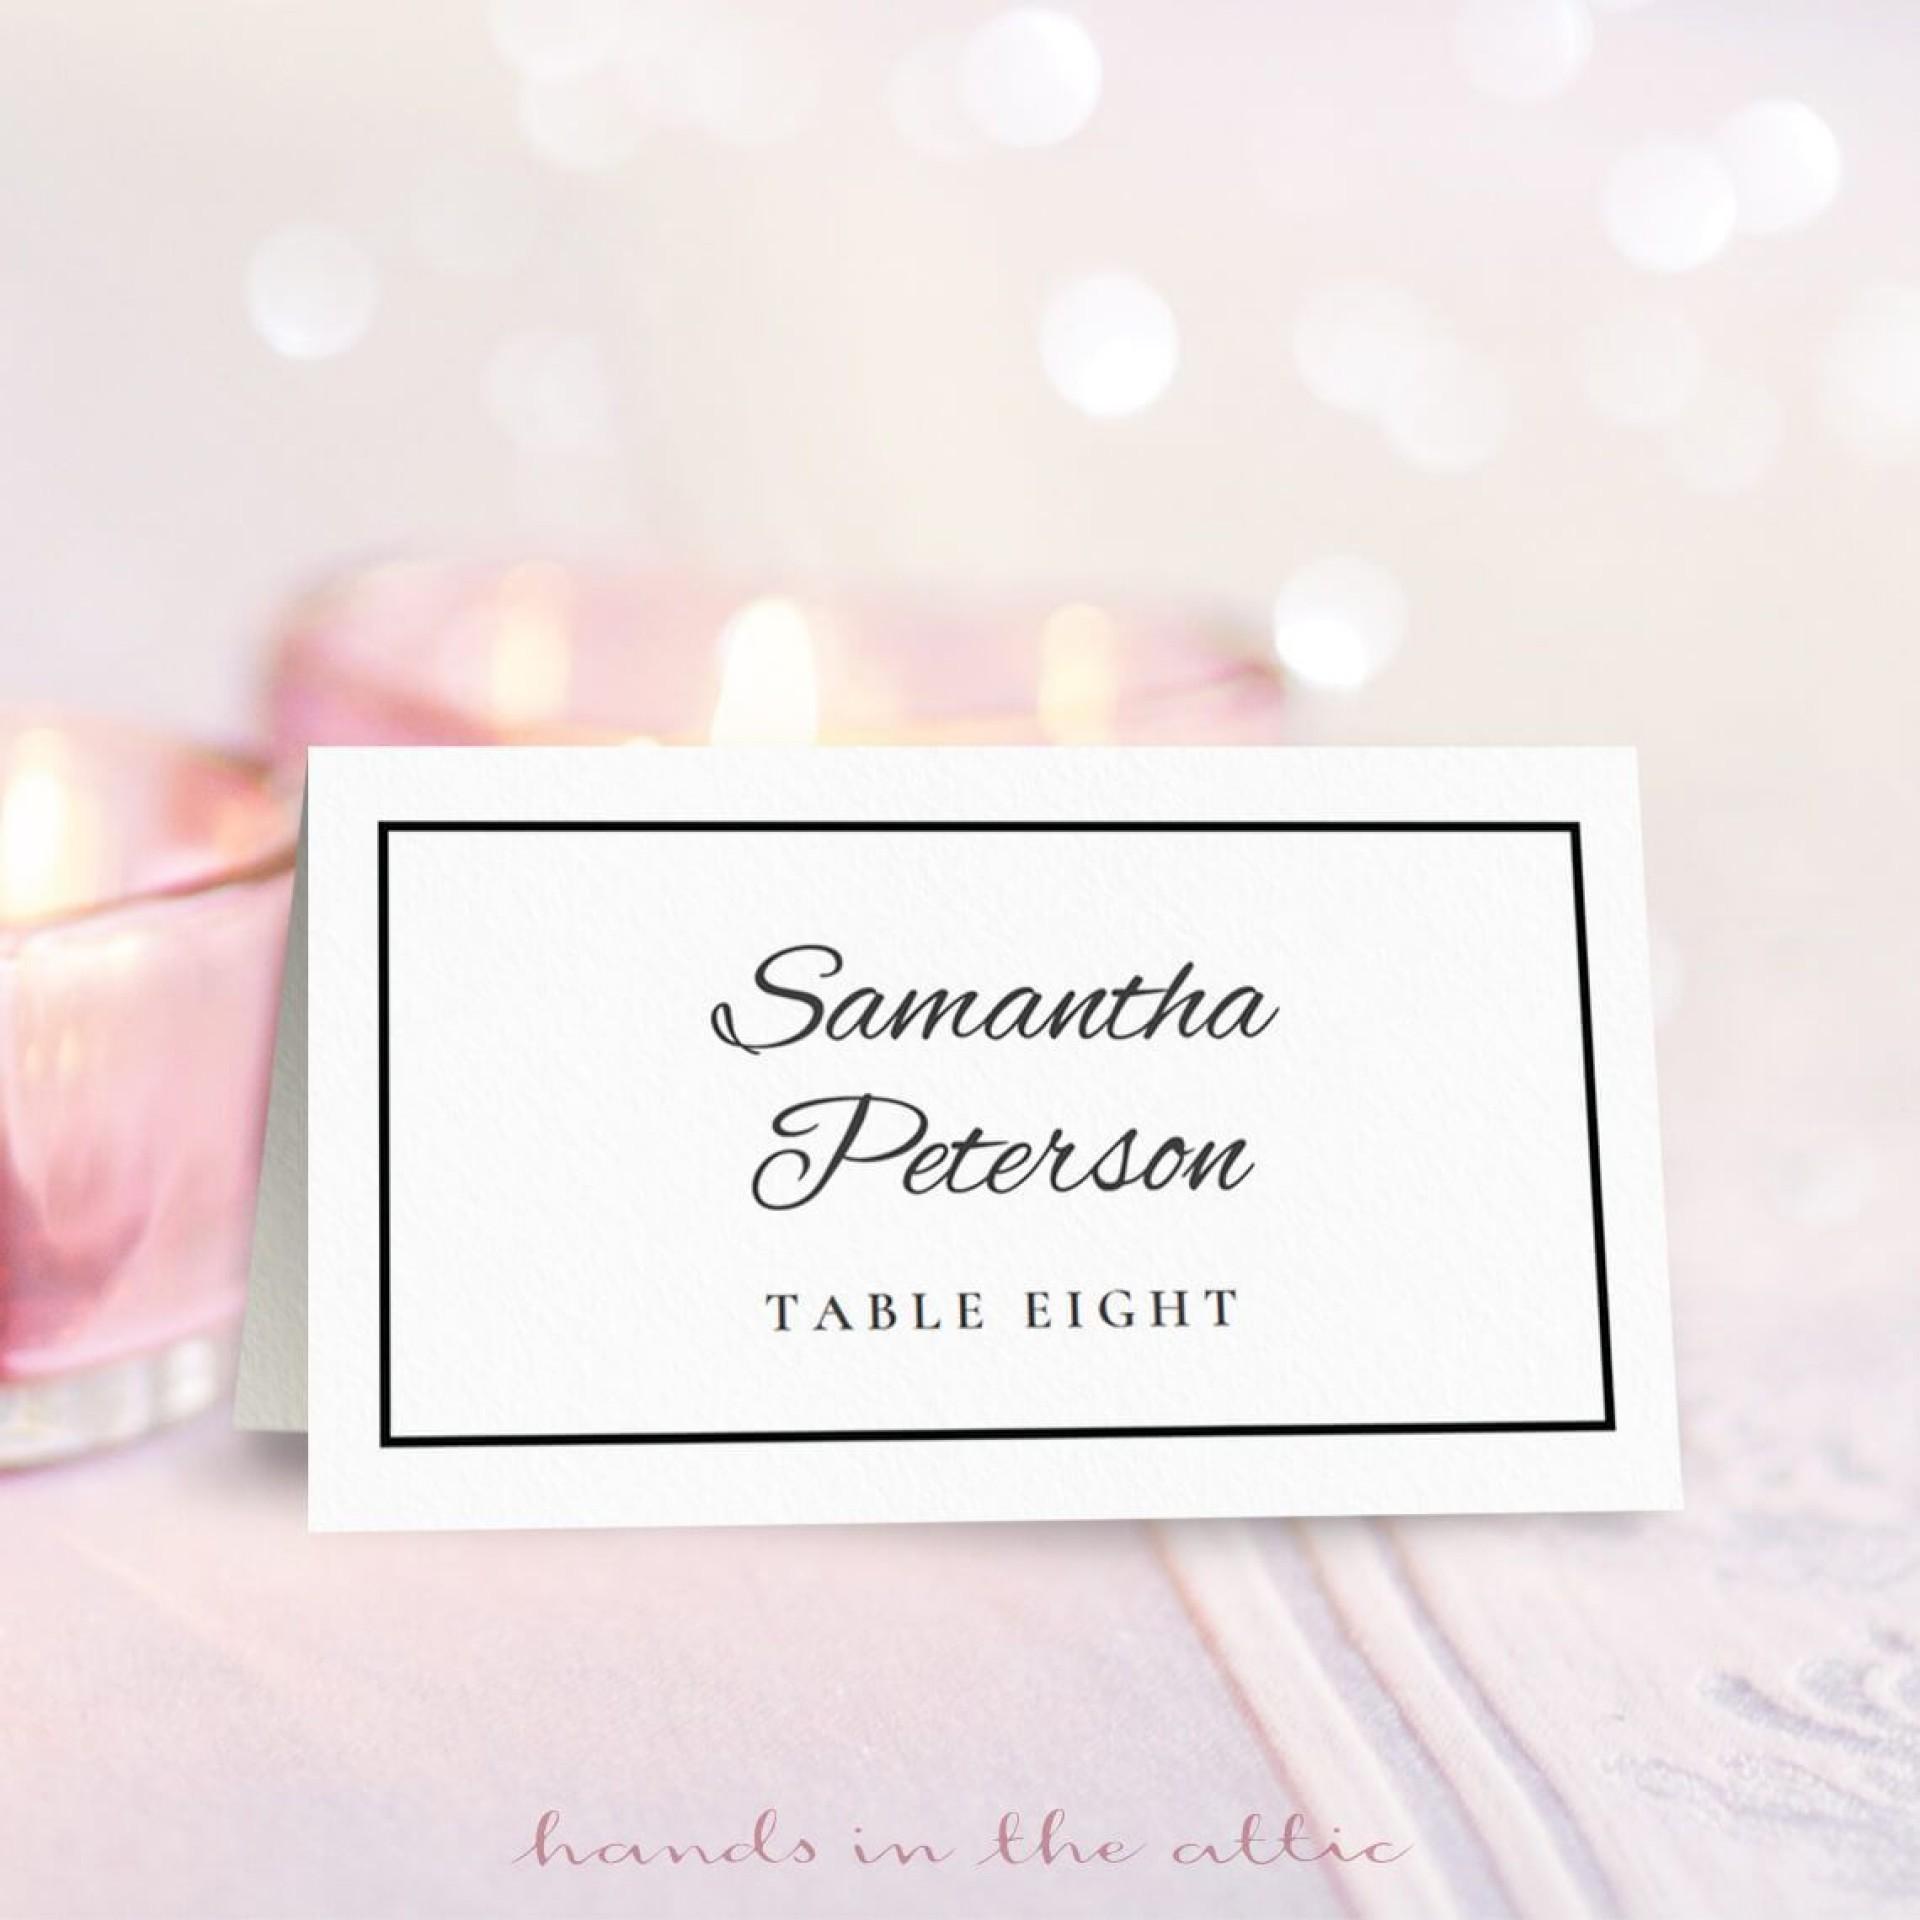 009 Phenomenal Wedding Name Card Template High Resolution  Free Download Design Sticker Format1920